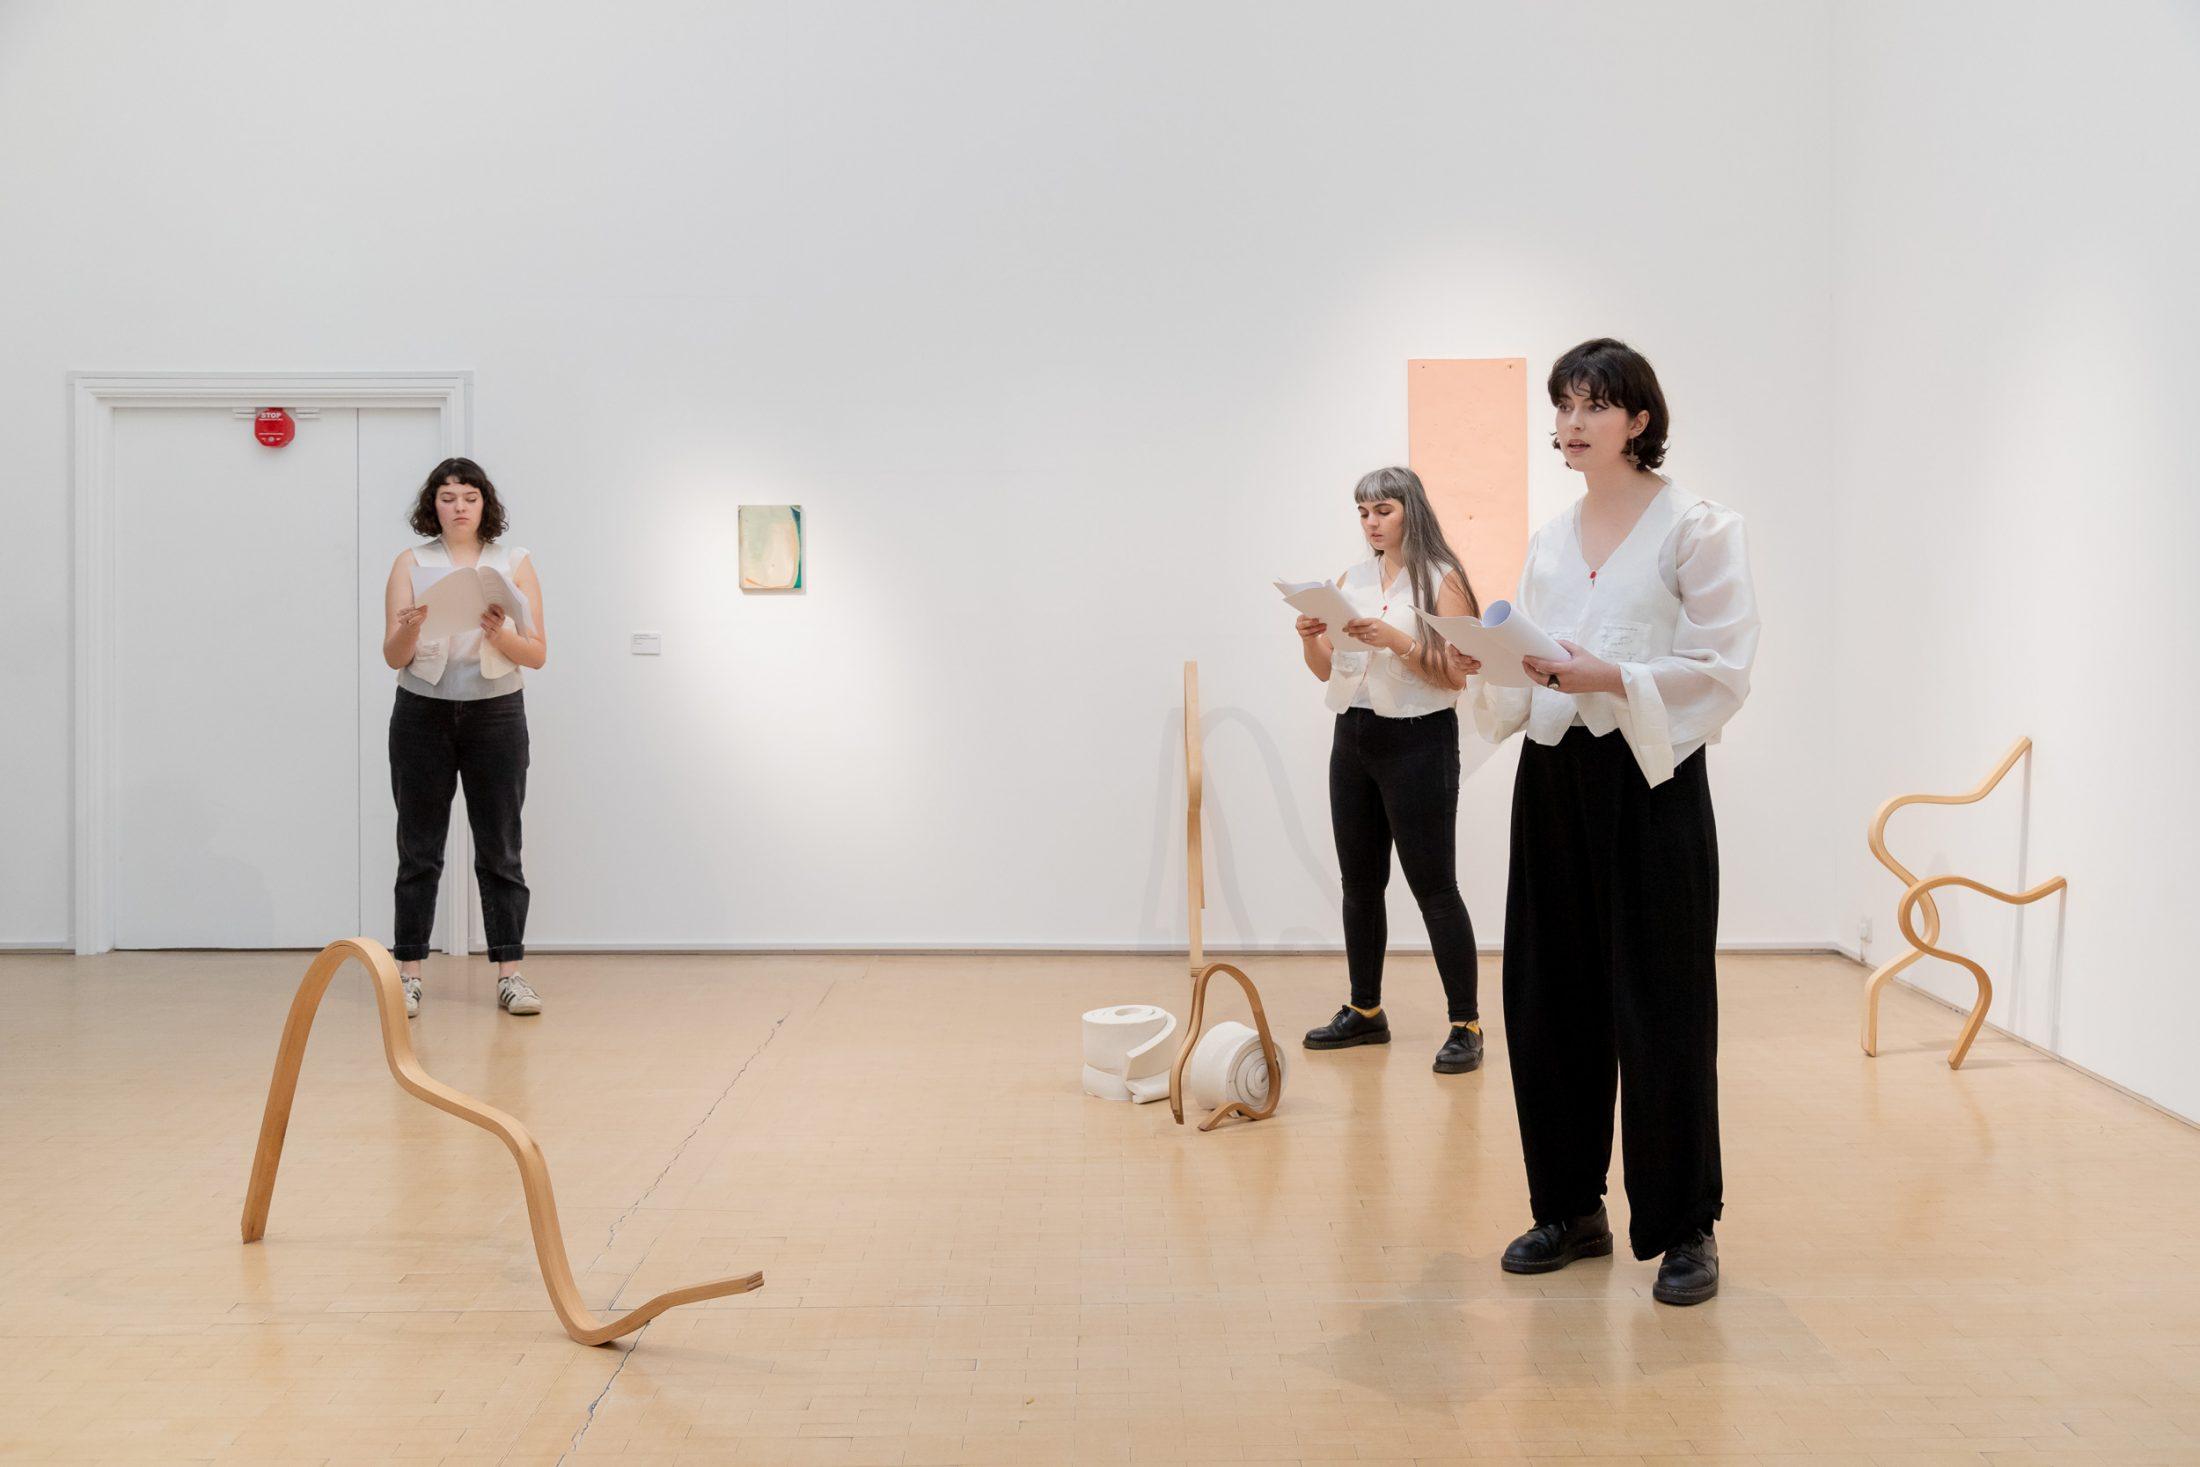 Performance at Leeds Art Gallery